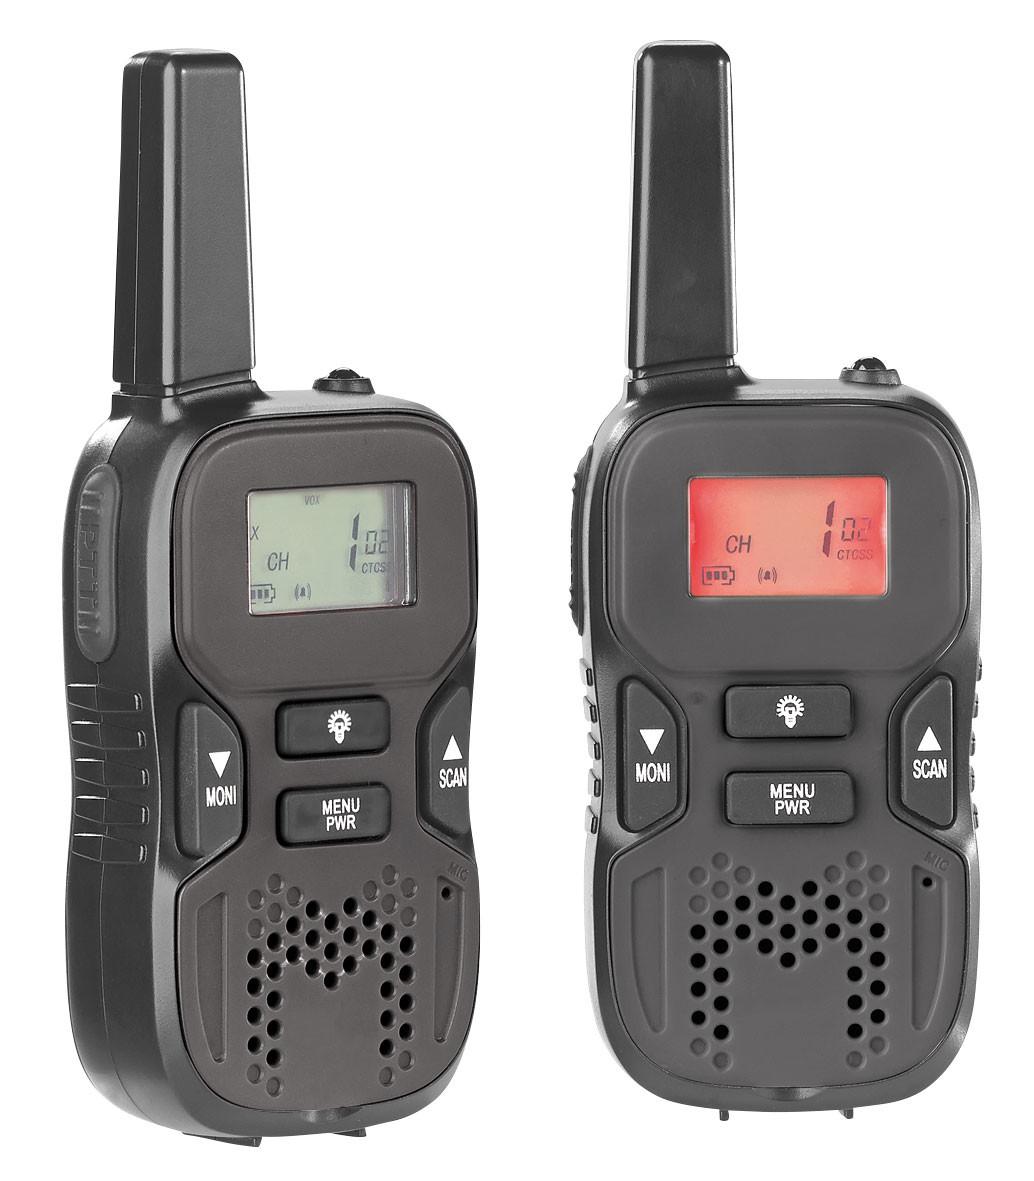 TalkiesWalkies Longue Portée Km Avec Fonction VOX Pour Moto Pearlfr - Talkie walkie longue portée